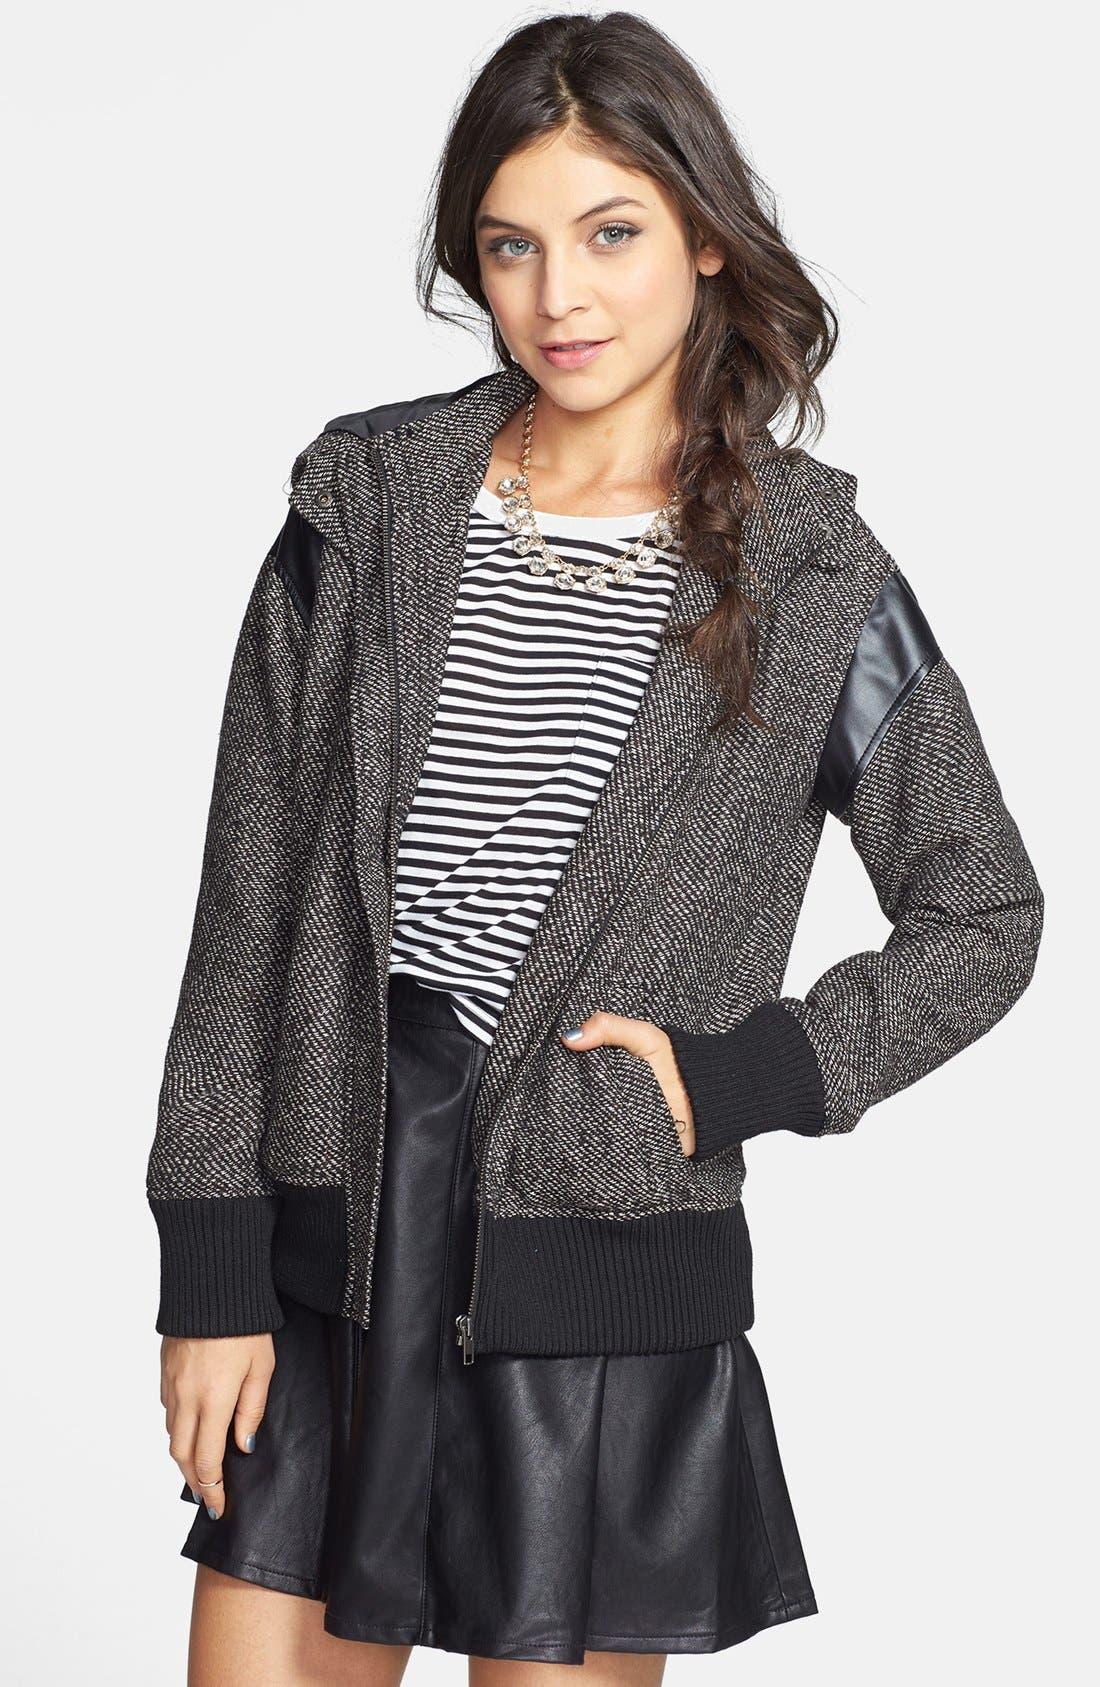 Alternate Image 1 Selected - BP. Faux Leather Shoulder Tweed Bomber Jacket (Juniors)